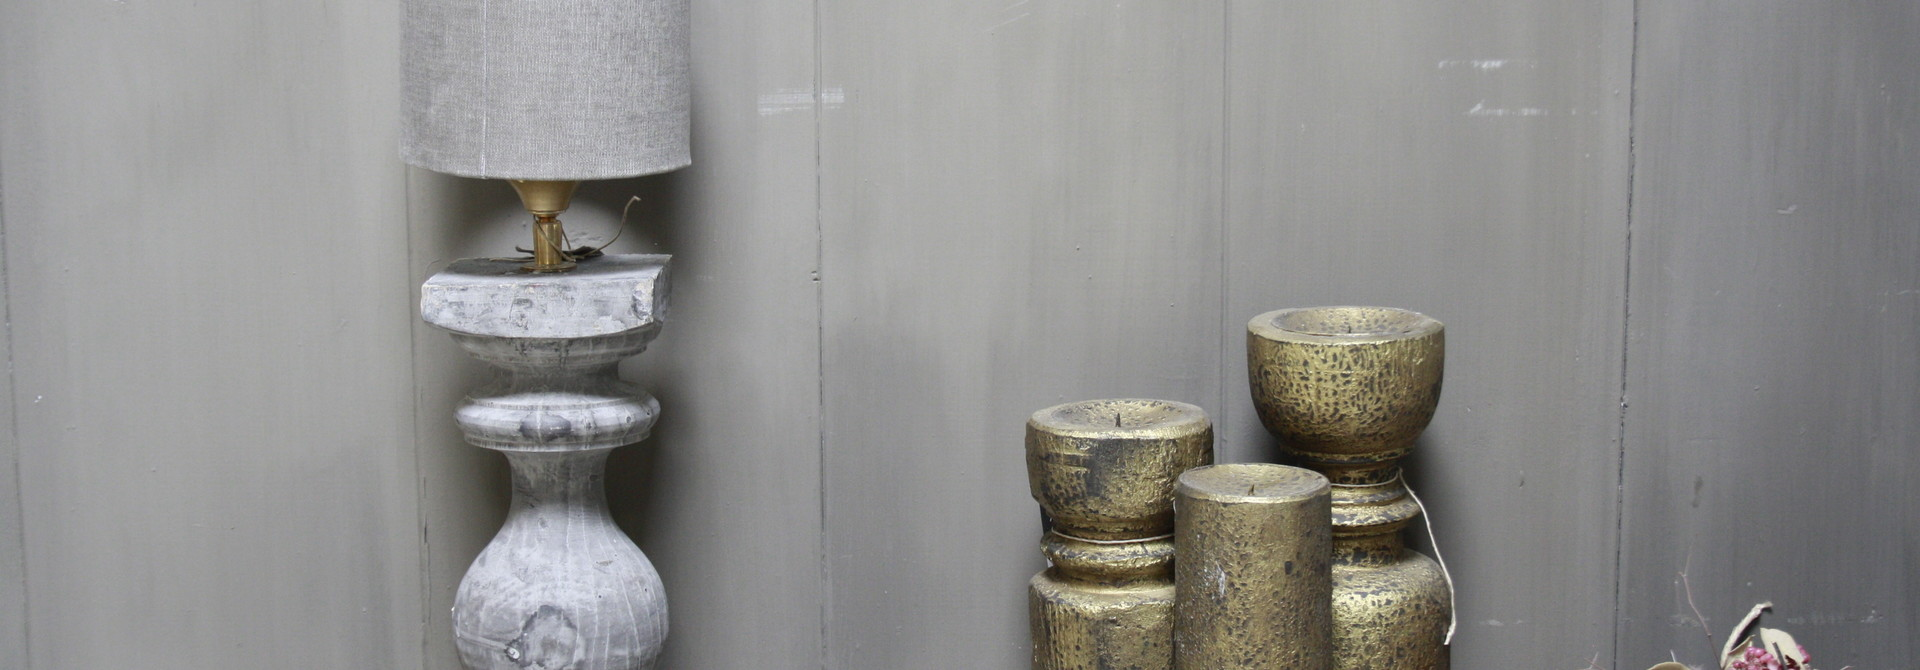 Aura peeperkorn grijs houten baluster lamp 42 cm